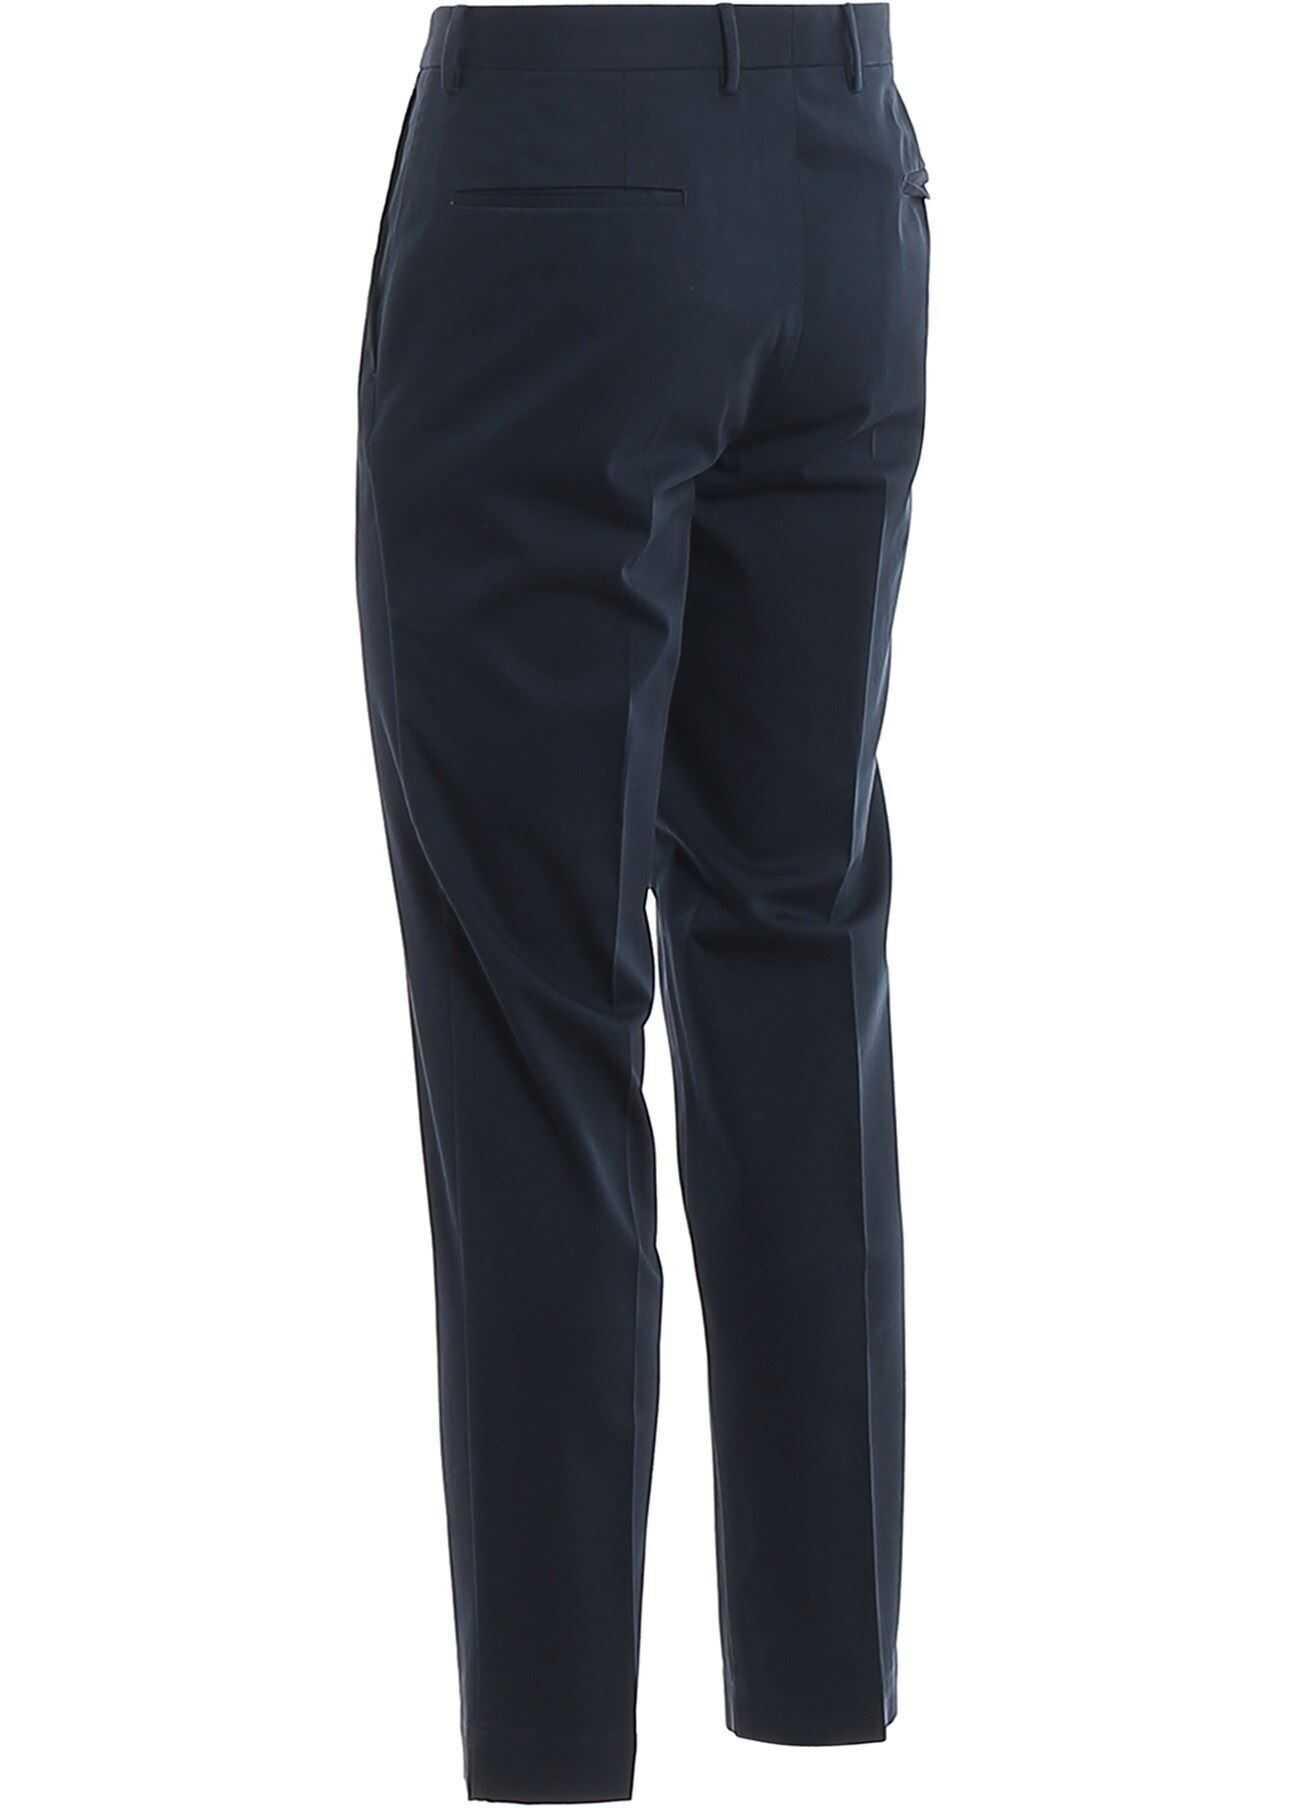 Incotex Cotton Tailored Pants Blue imagine